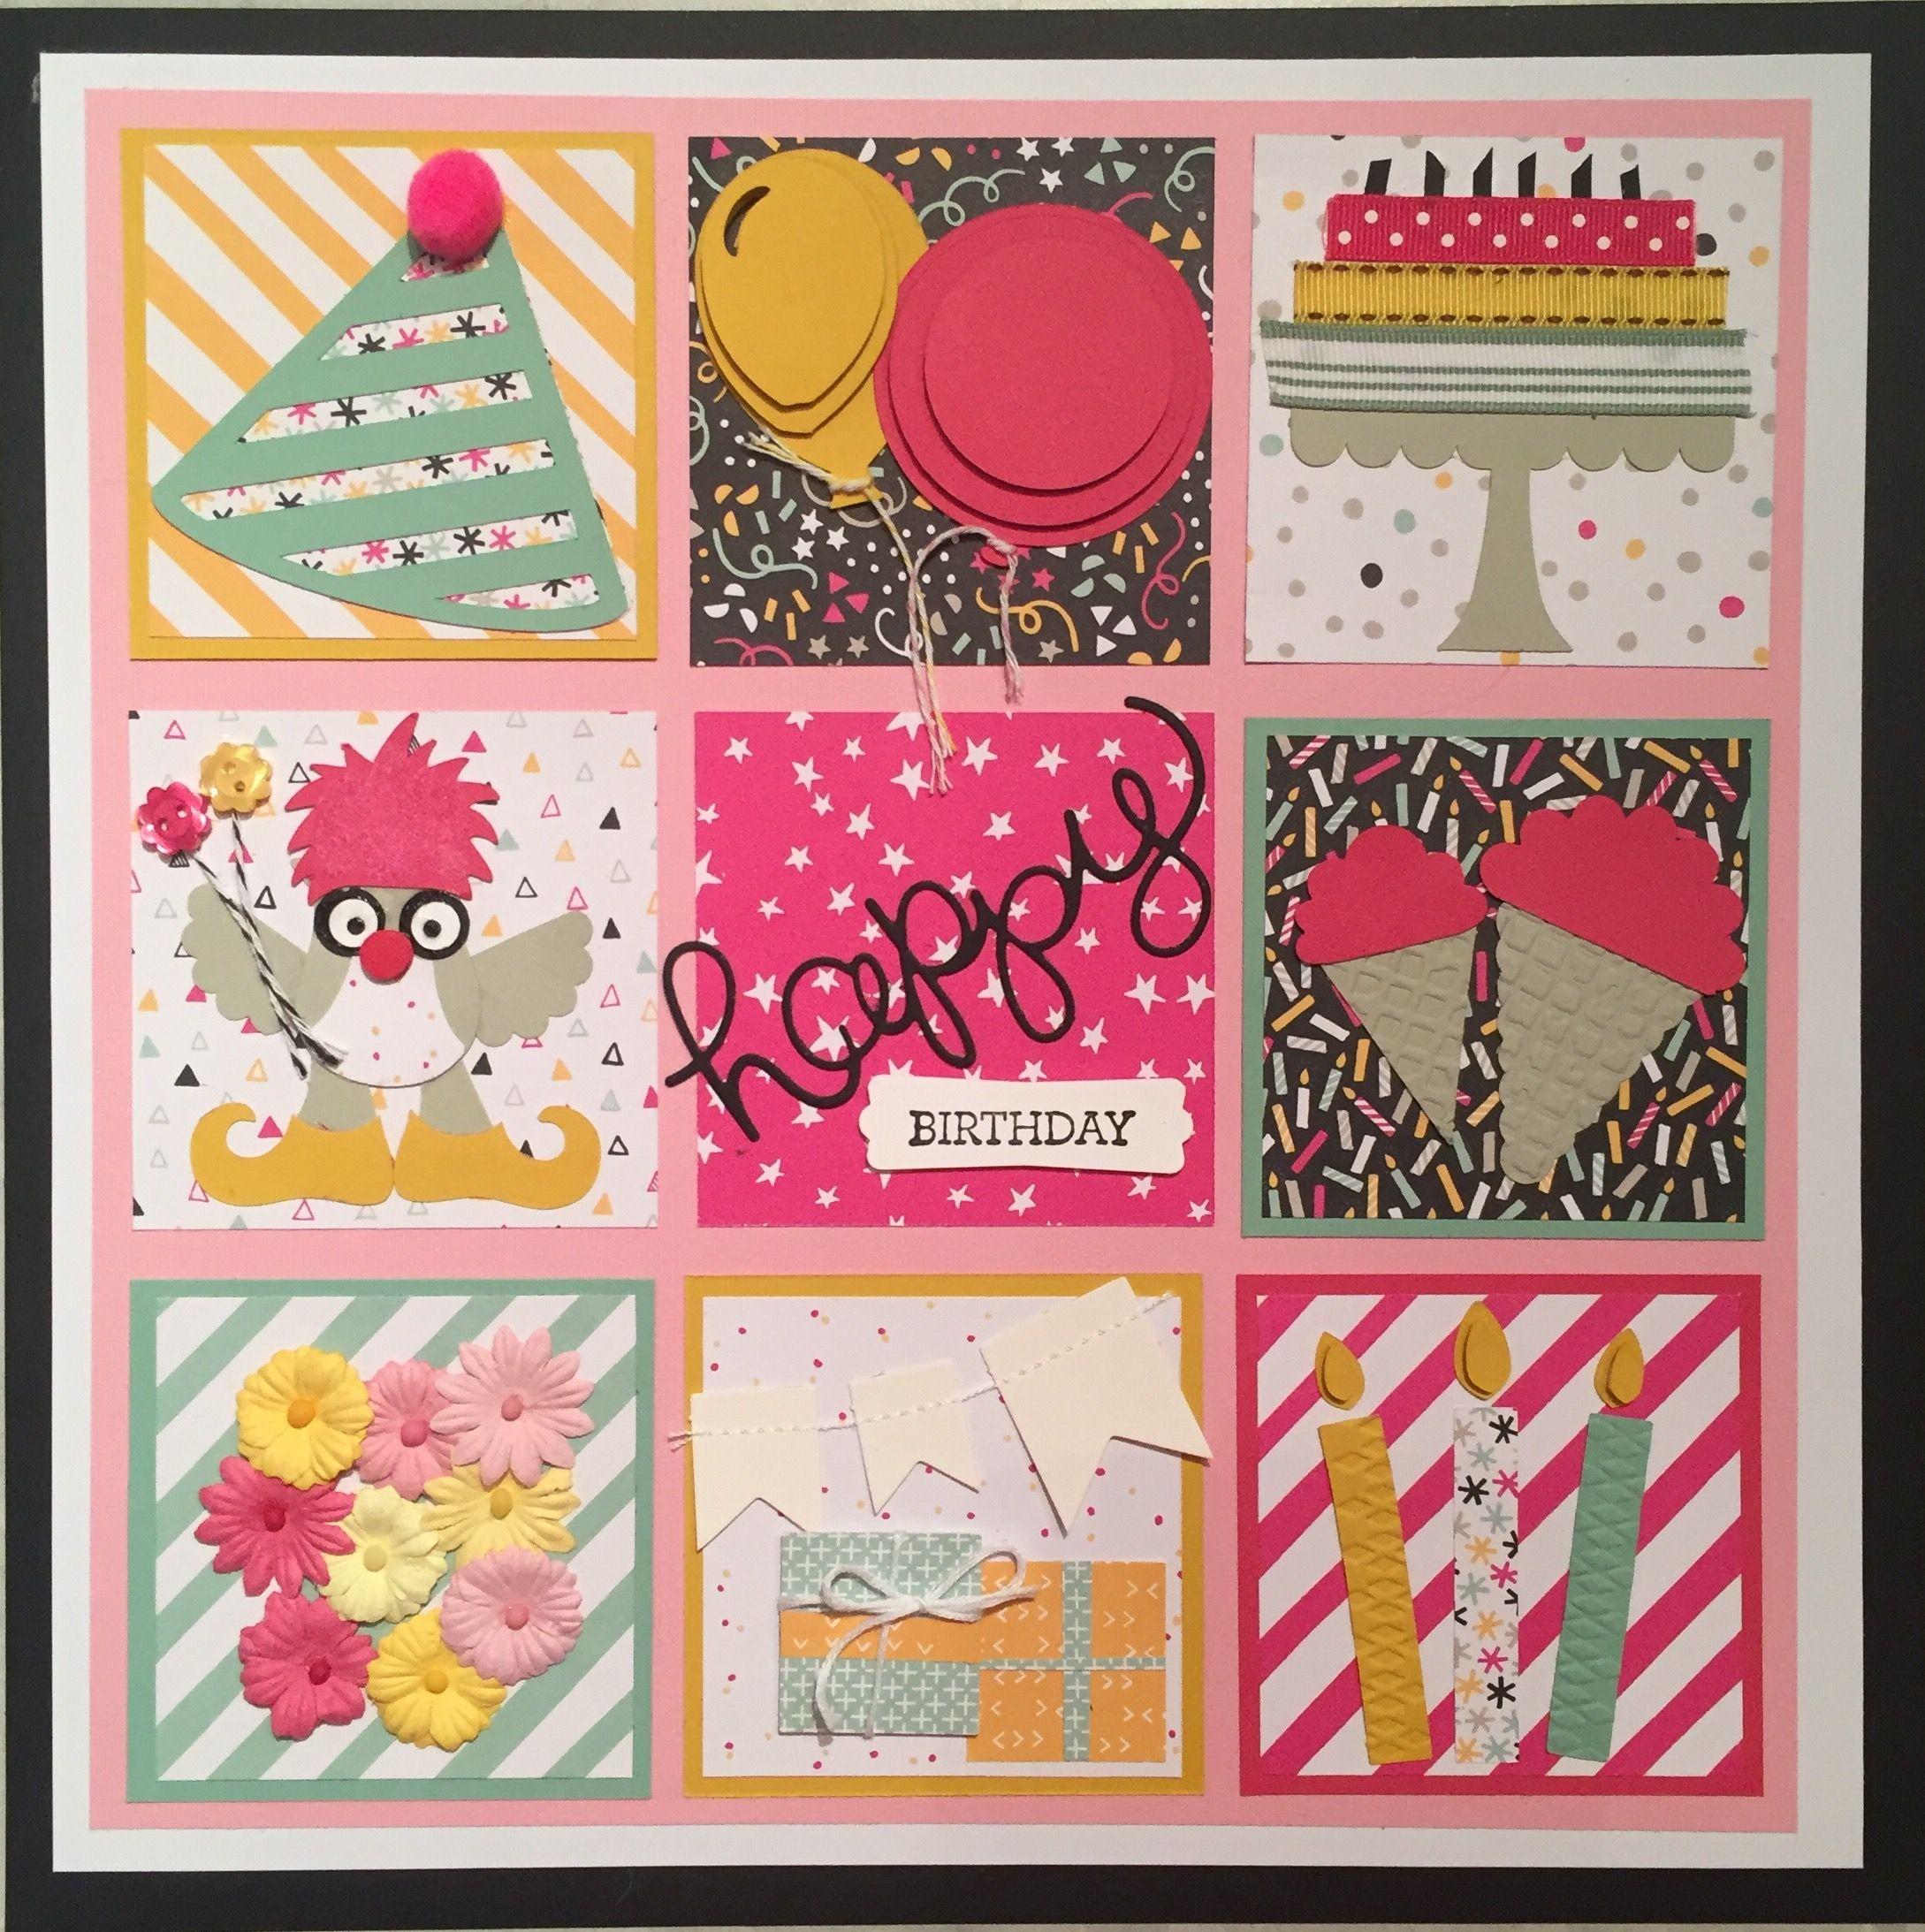 happy birthday stampinup  paper crafts card art paper